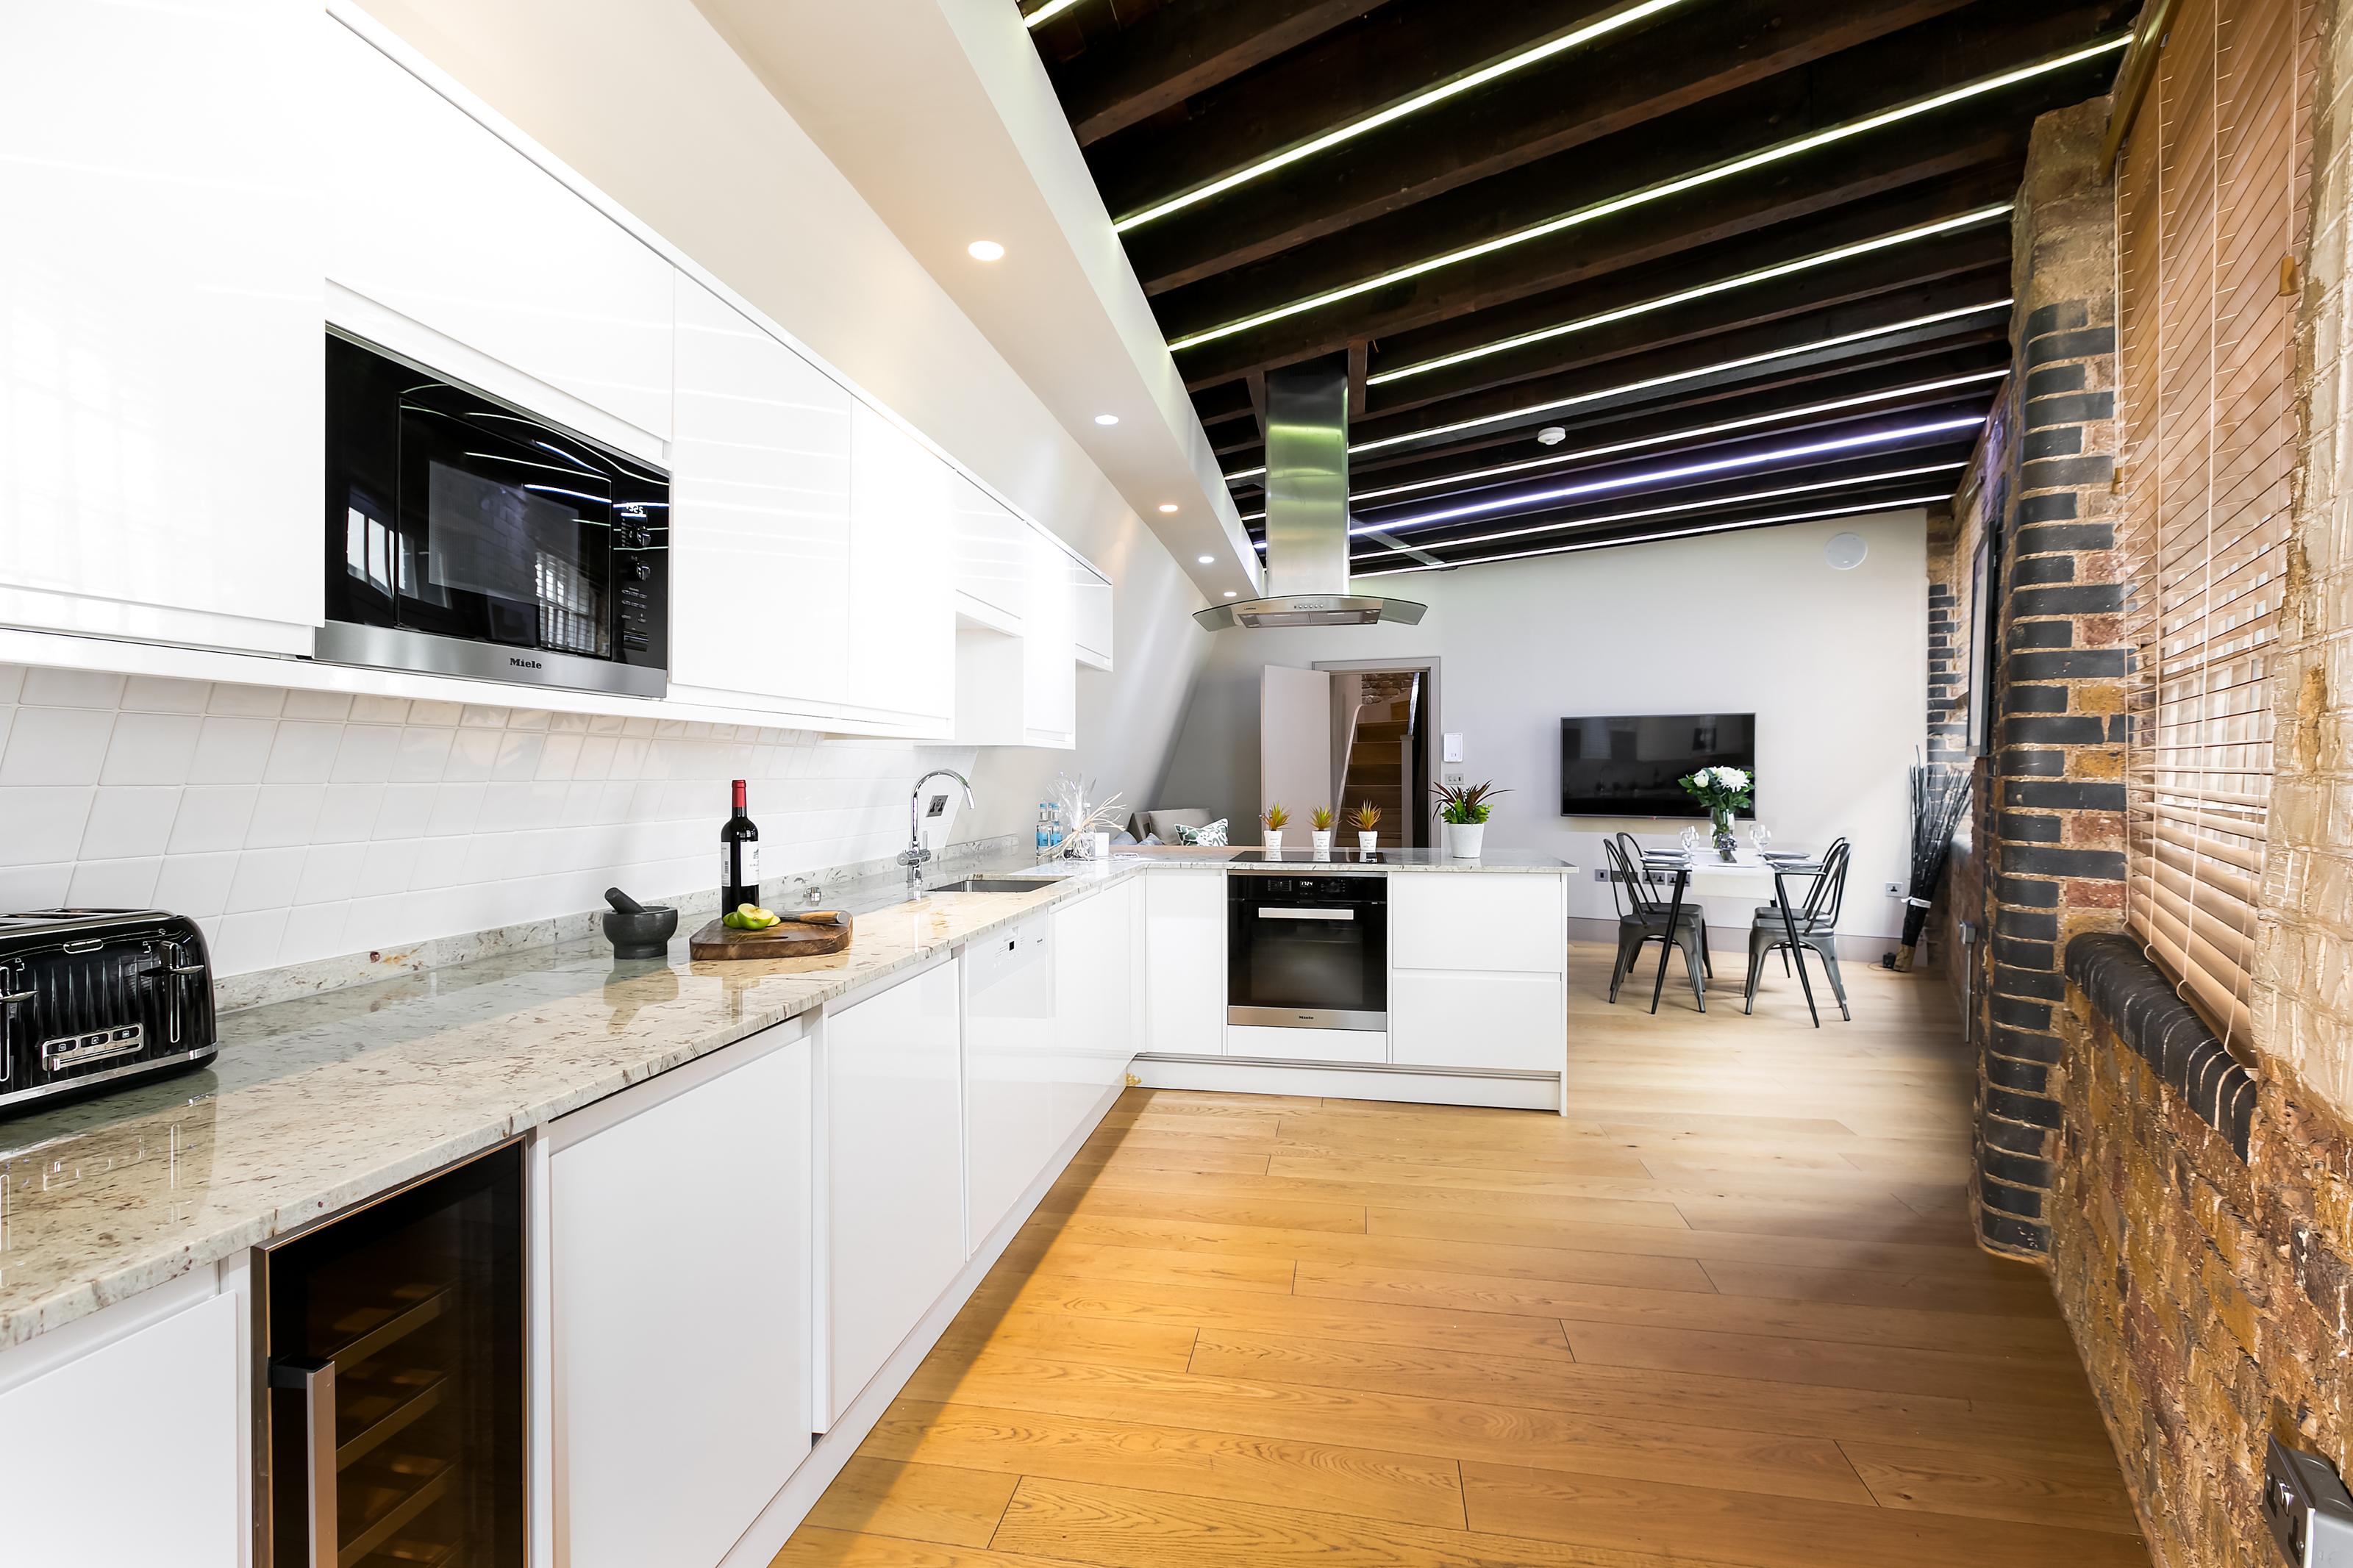 Lovelydays luxury service apartment rental - London - Fitzrovia - Wells Mews A - Lovelysuite - 2 bedrooms - 2 bathrooms - Luxury kitchen - 5 star serviced apartments in london - edbe6add2deb - Lovelydays